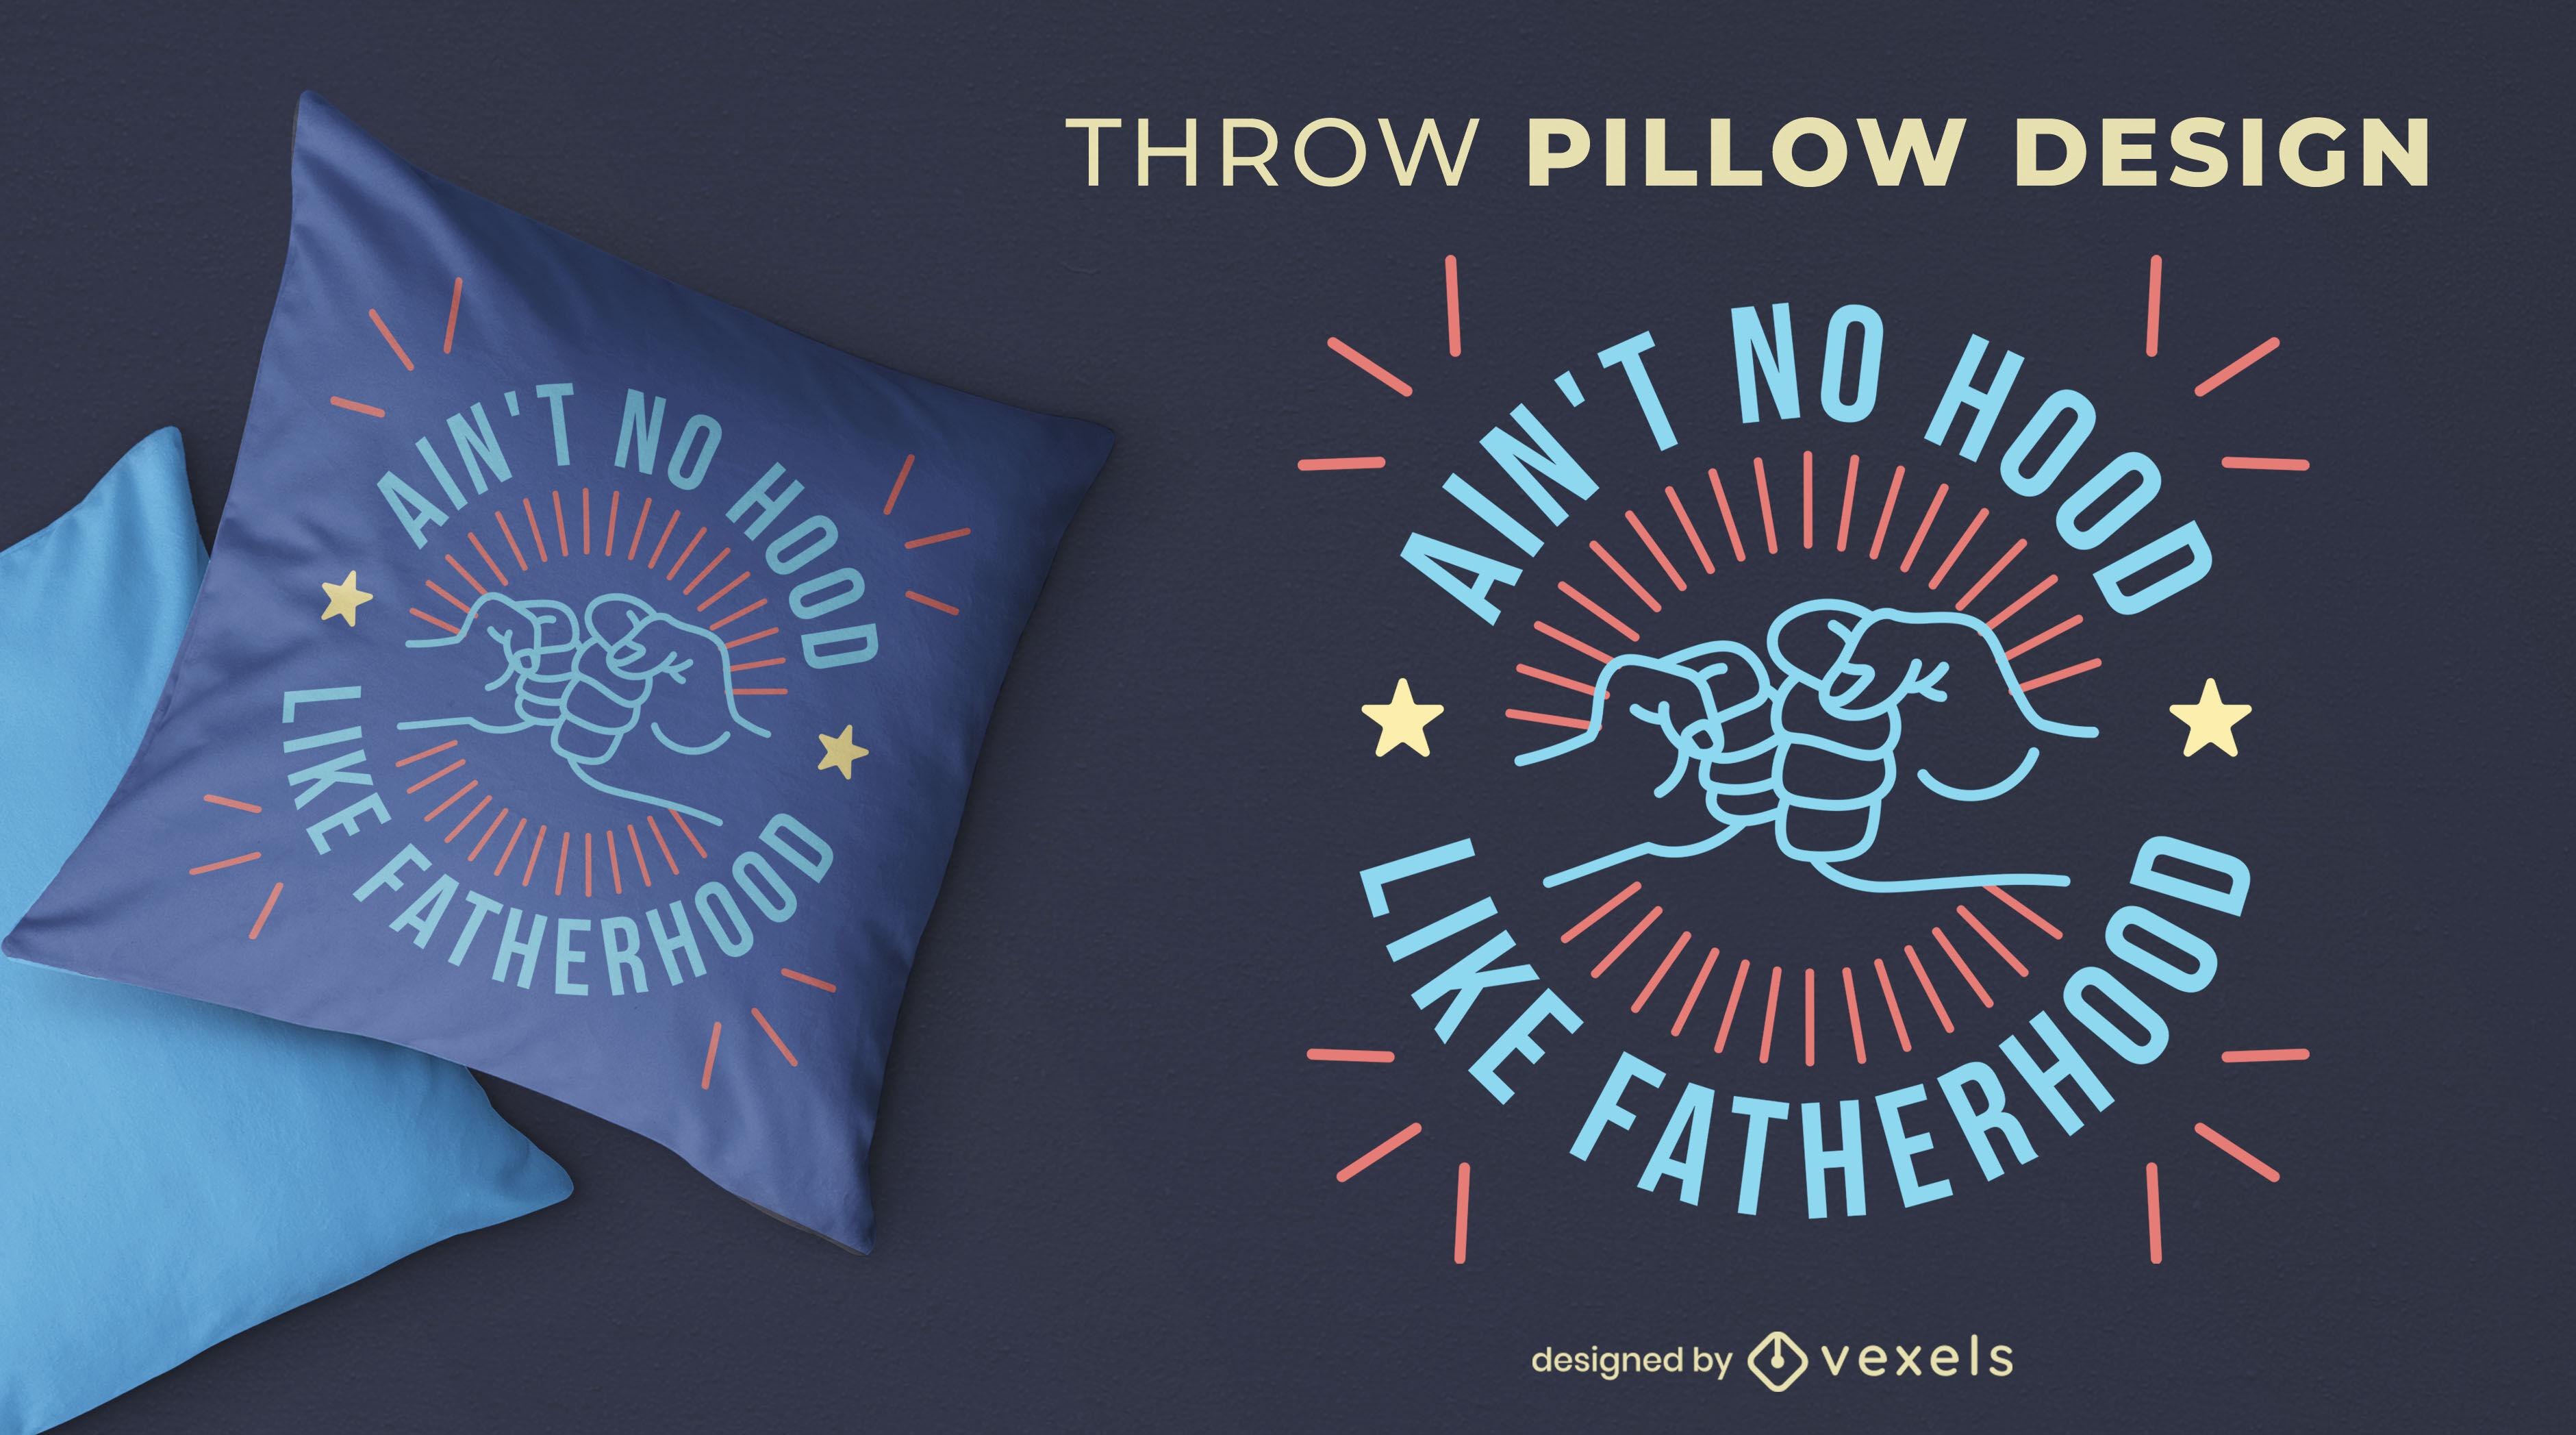 Fist bump funny throw pillow design